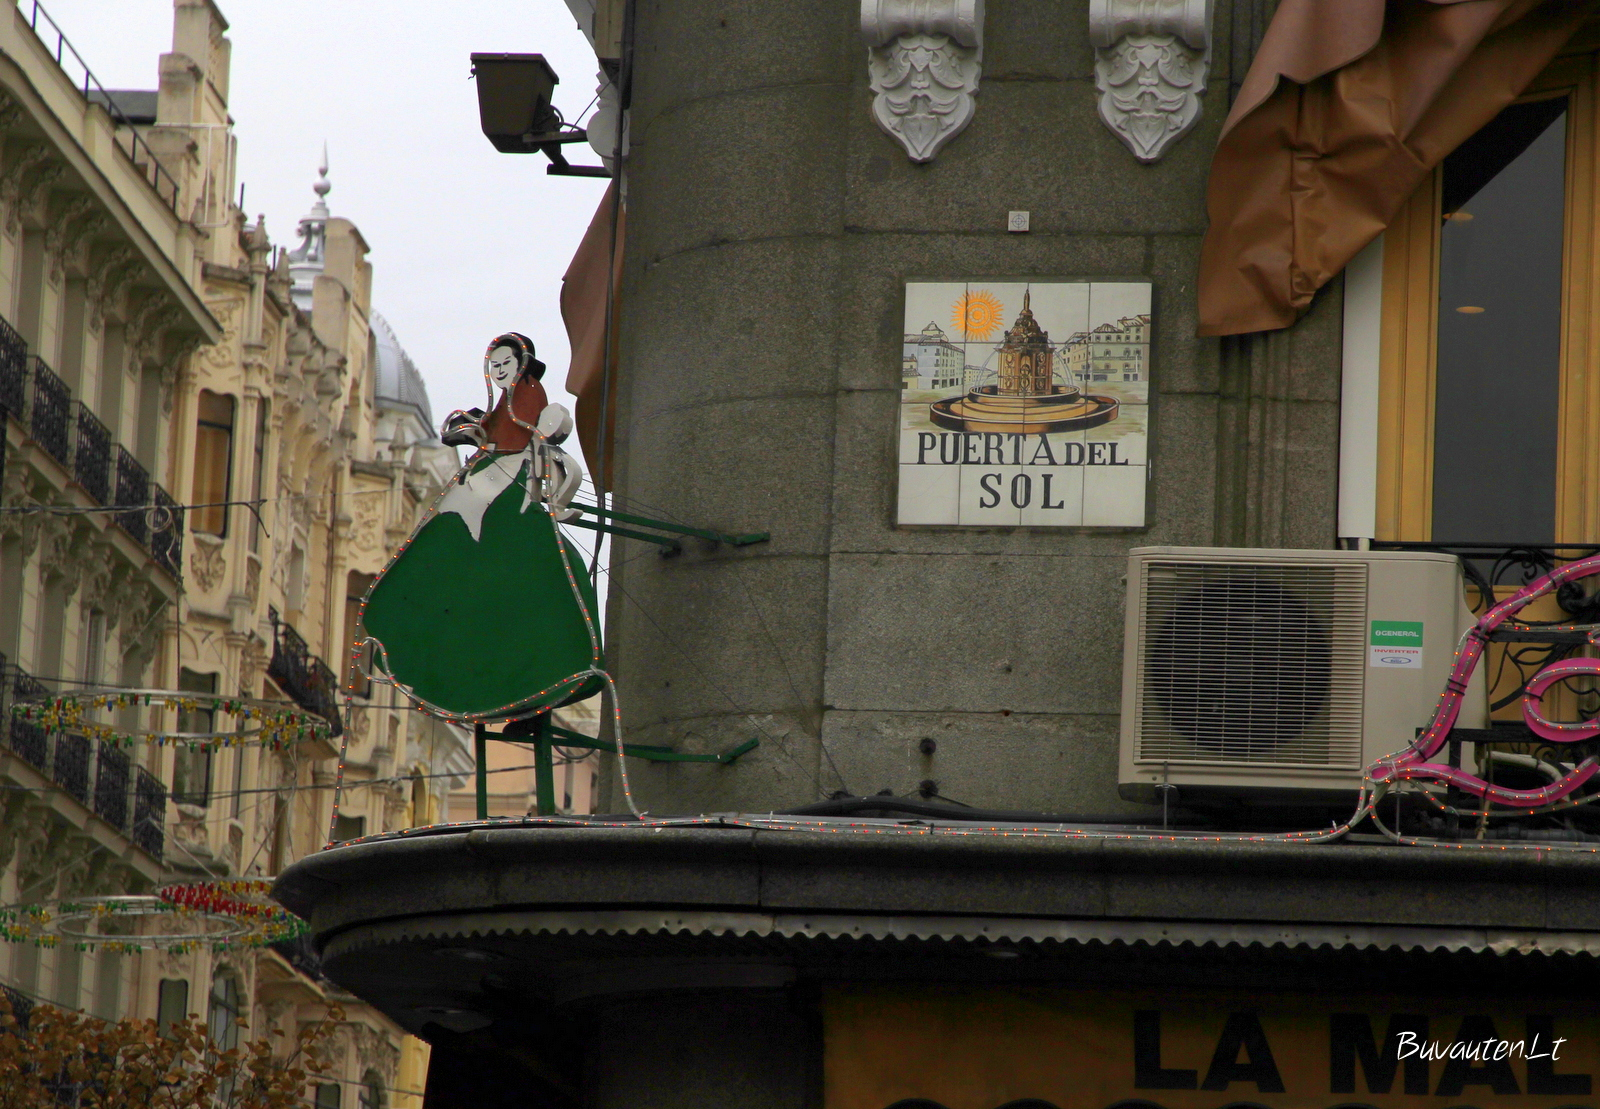 Puerta del Sol aikštės detalė